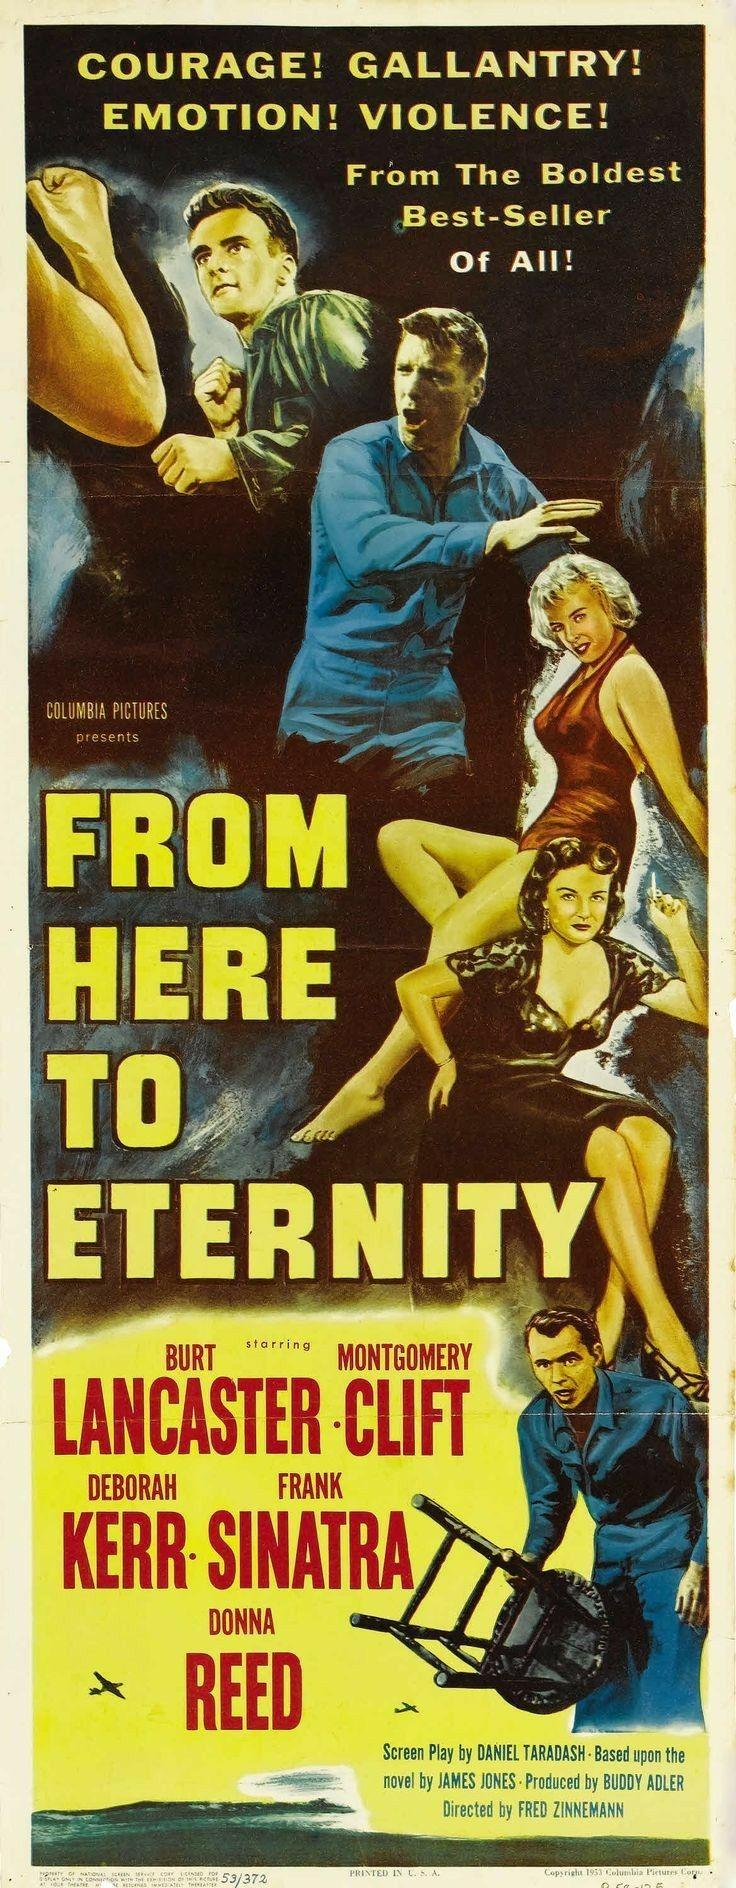 From Here to Eternity (1953) Burt Lancaster, Montgomery Clift, Deborah Kerr, Frank Sinatra, Donna Reed